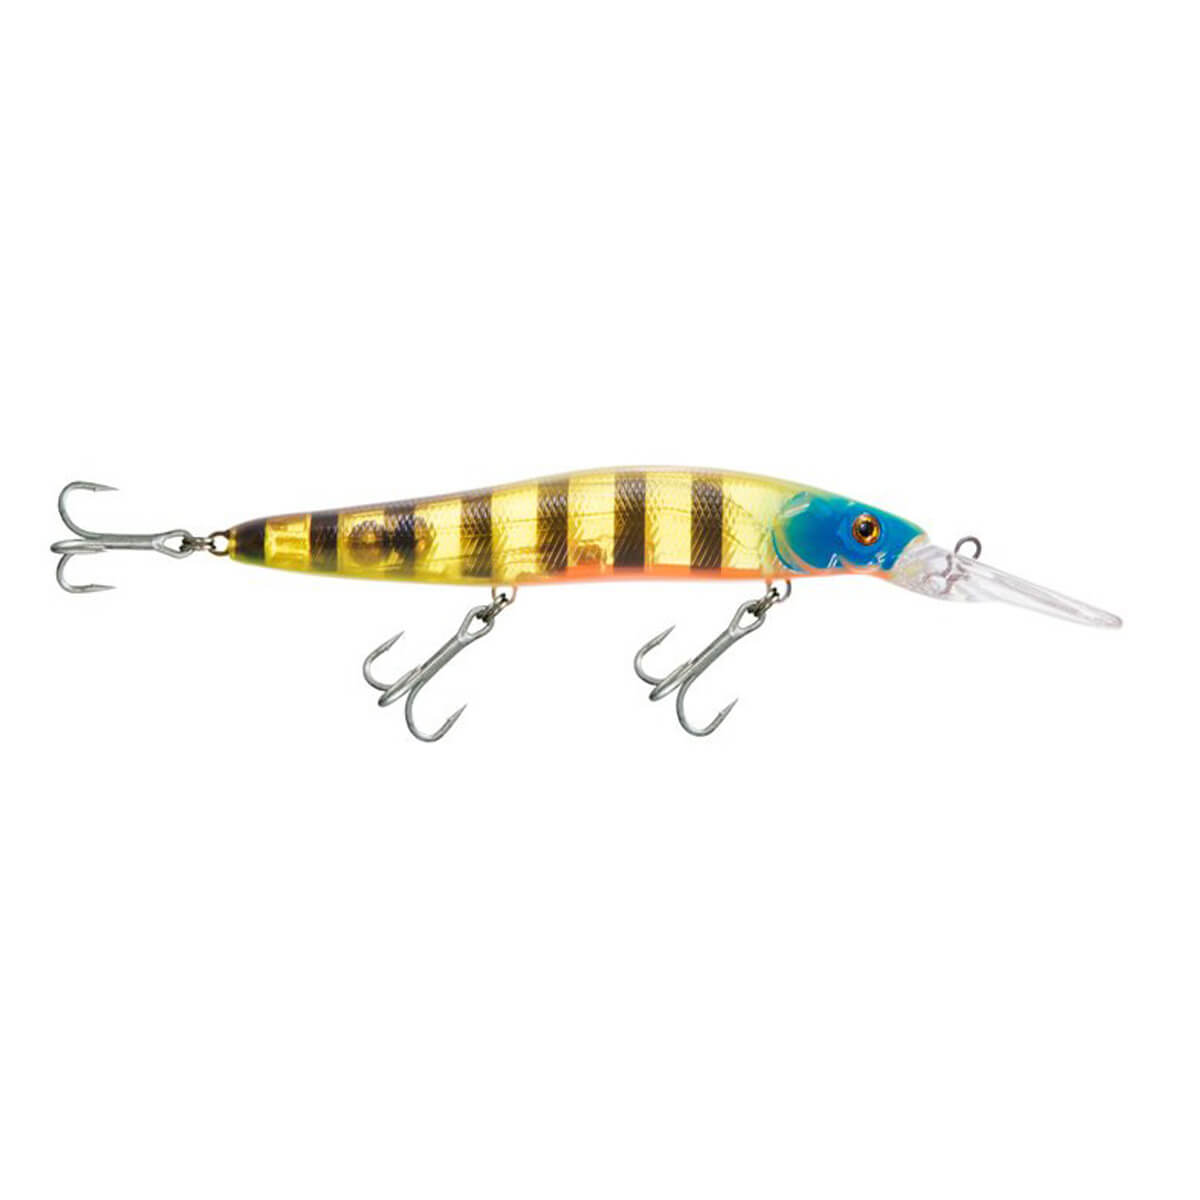 Isca Artificial Lori Mais 110  - Pró Pesca Shop